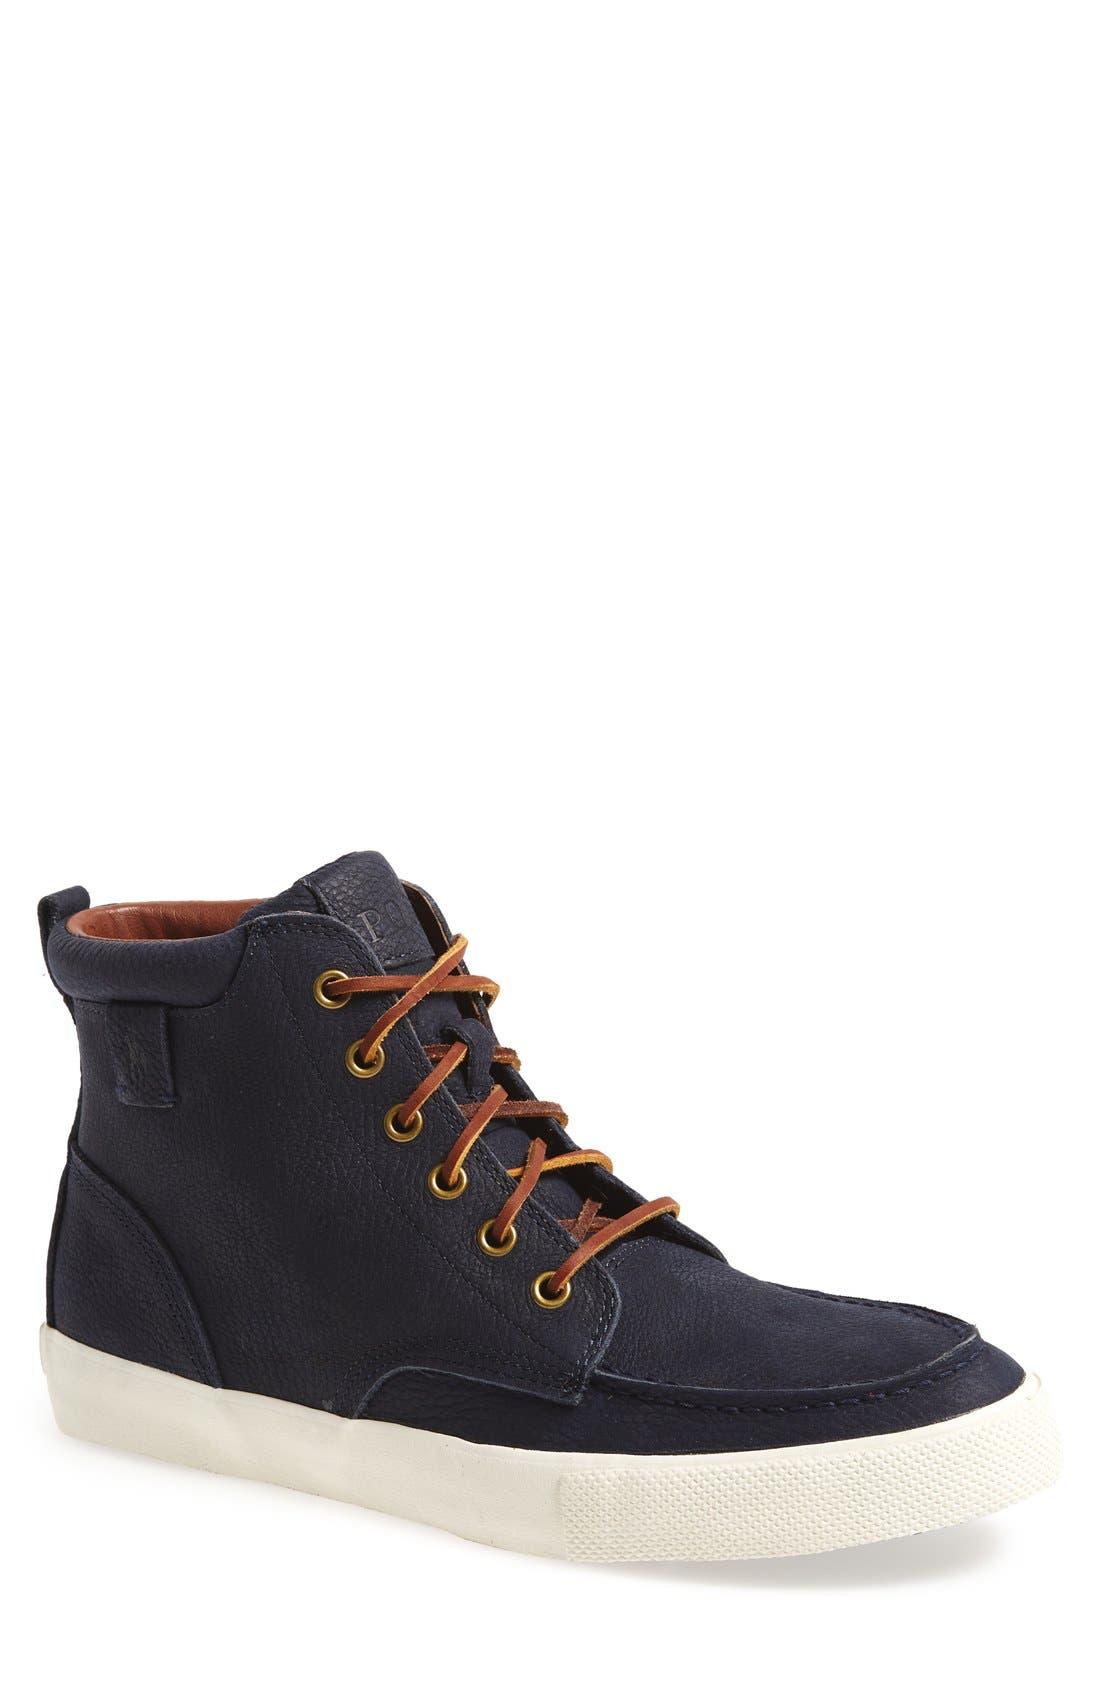 Main Image - Polo Ralph Lauren 'Tedd' Sneaker (Men)